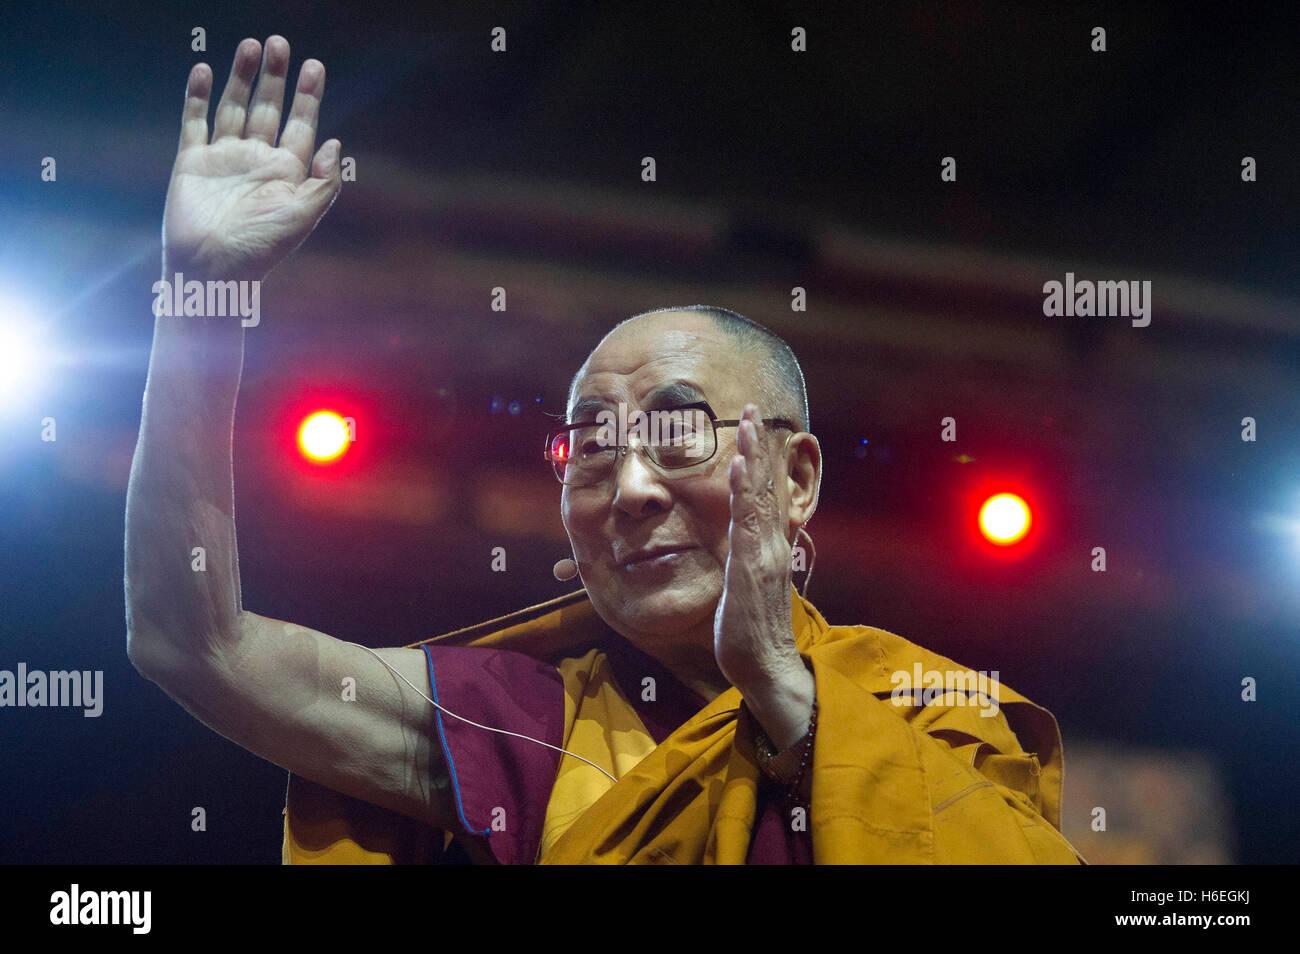 Italy, Milan, October 21, visit XVI Dalai Lama Tenzin Gyatzo in Milan    Photo © Matteo Biatta/Sintesi/Alamy - Stock Image